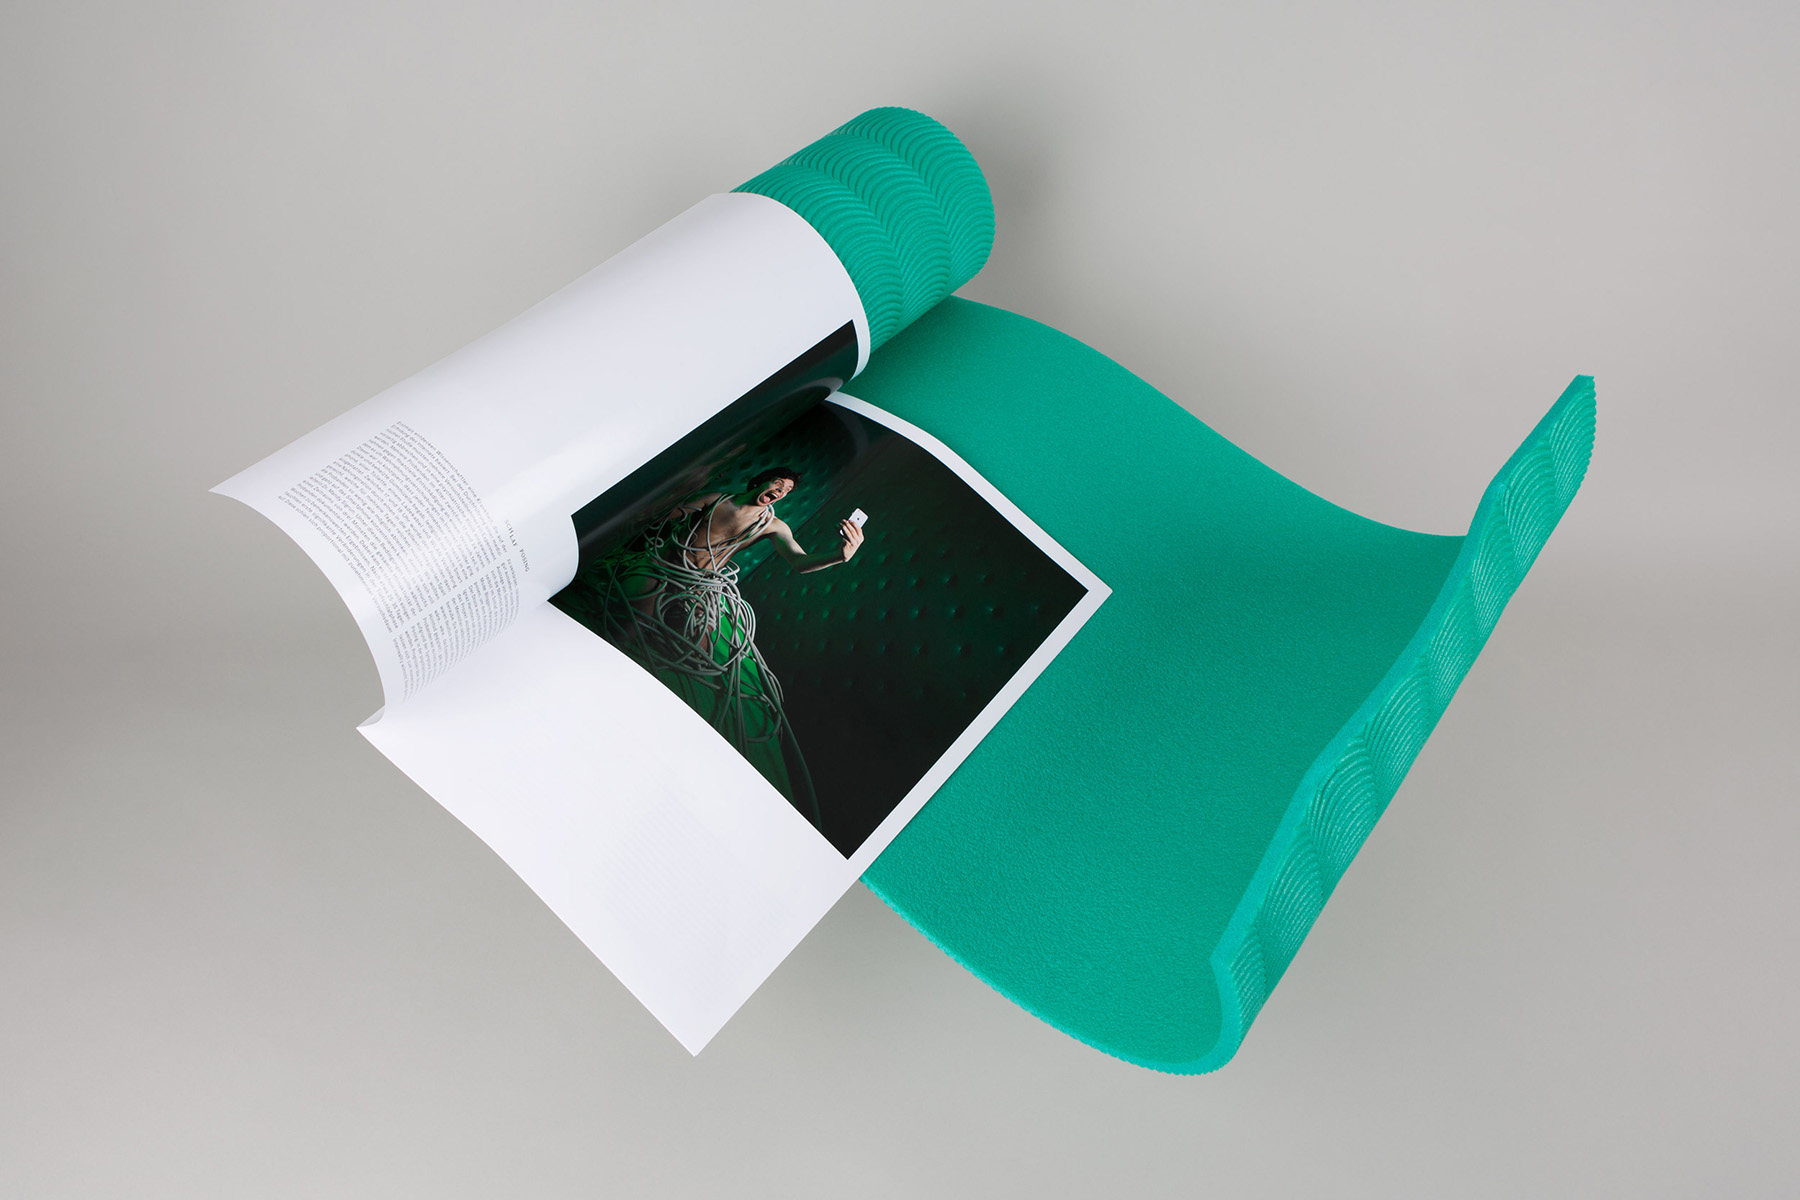 Interreality, Alexander Iskin, Christoph Neumann, Agnes Friedrich, Studio SO